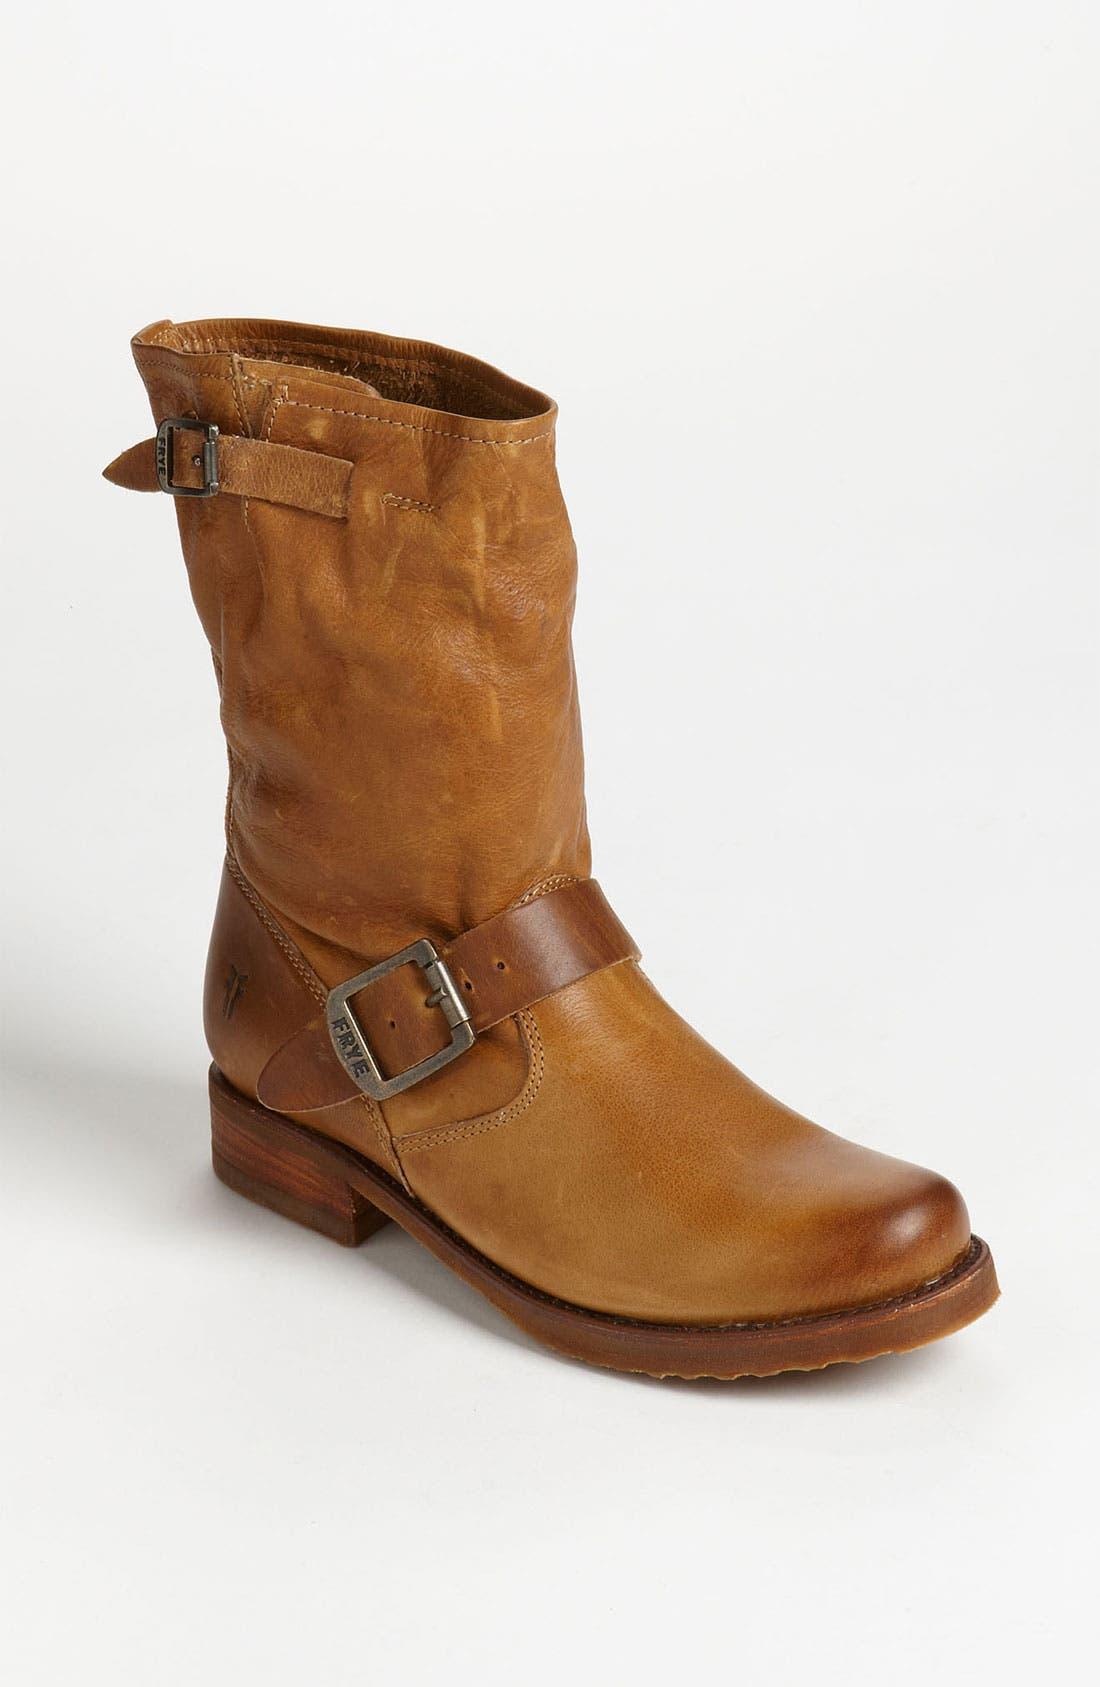 Alternate Image 1 Selected - Frye 'Veronica Short' Slouchy Boot (Women)